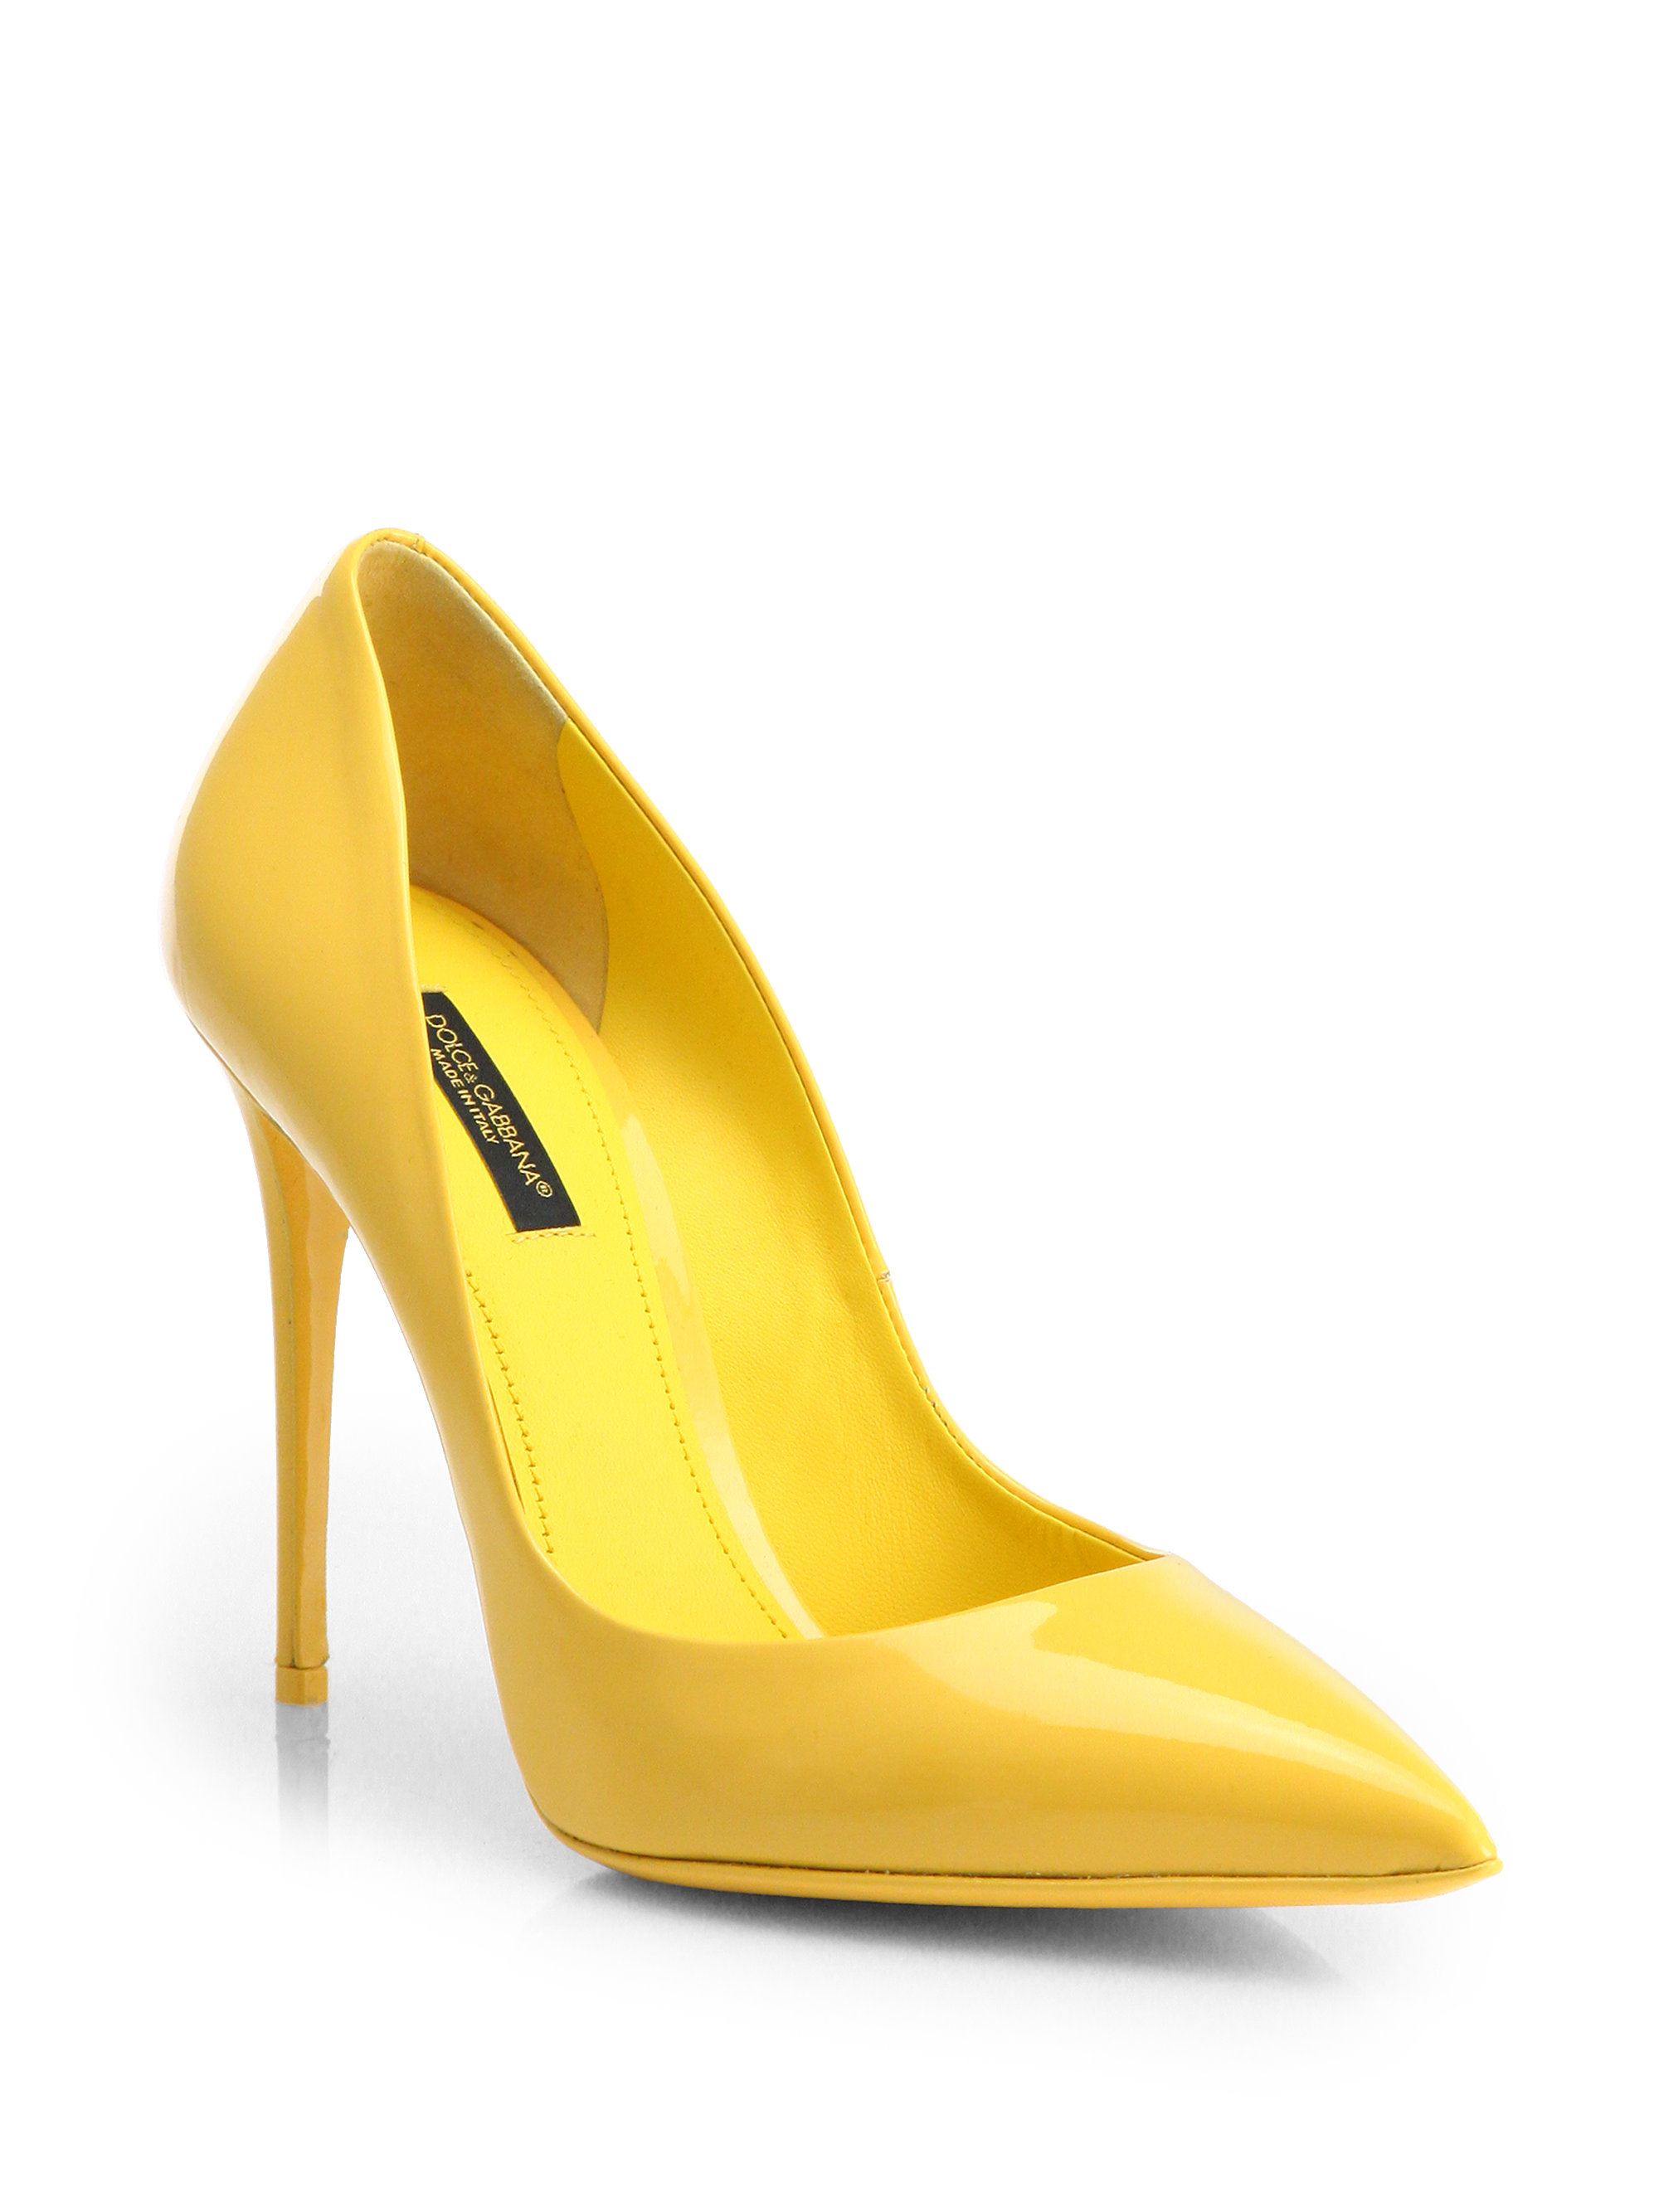 Leather Pumps Patent Dolceamp; Yellow Gabbana Kate 7gIvbf6yYm